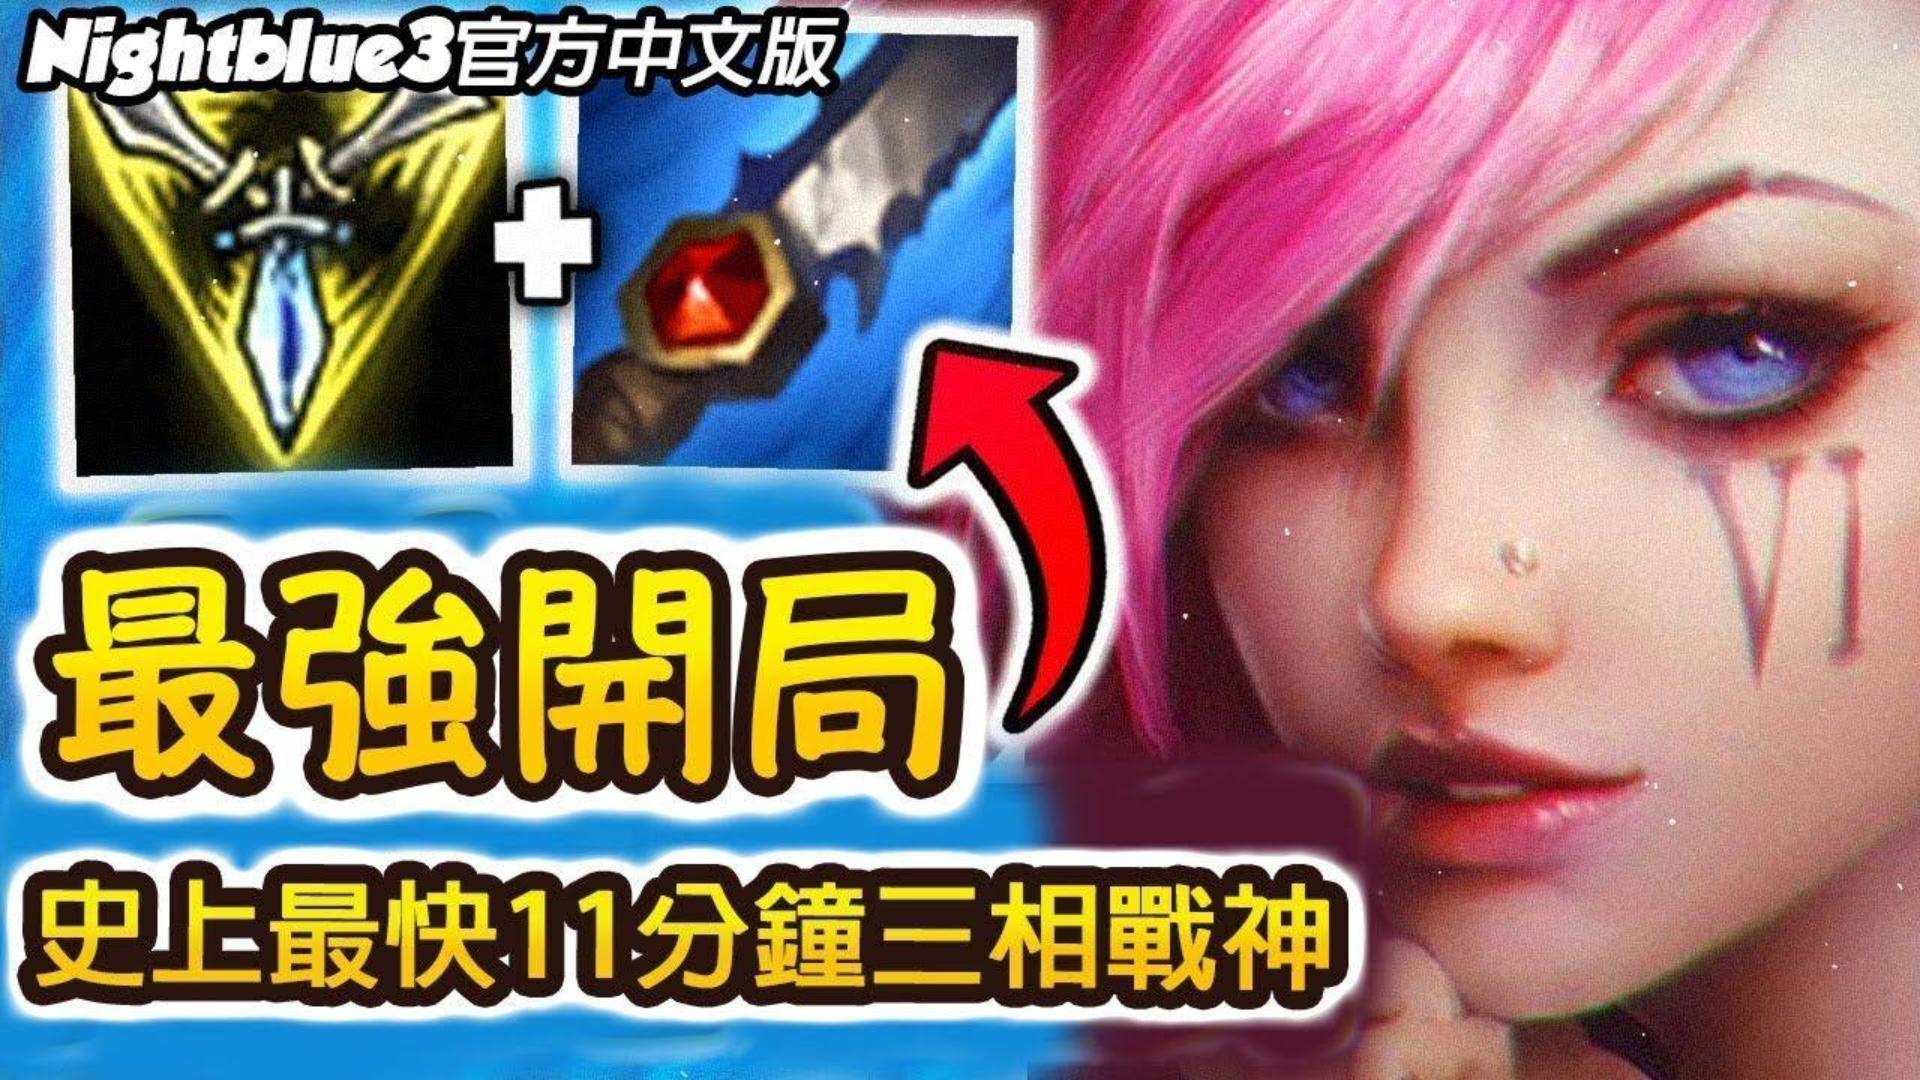 「Nightblue3精華」1000場蔚教学 20分钟单吃大龙最強套路!(中文字幕) LoL英雄聯盟